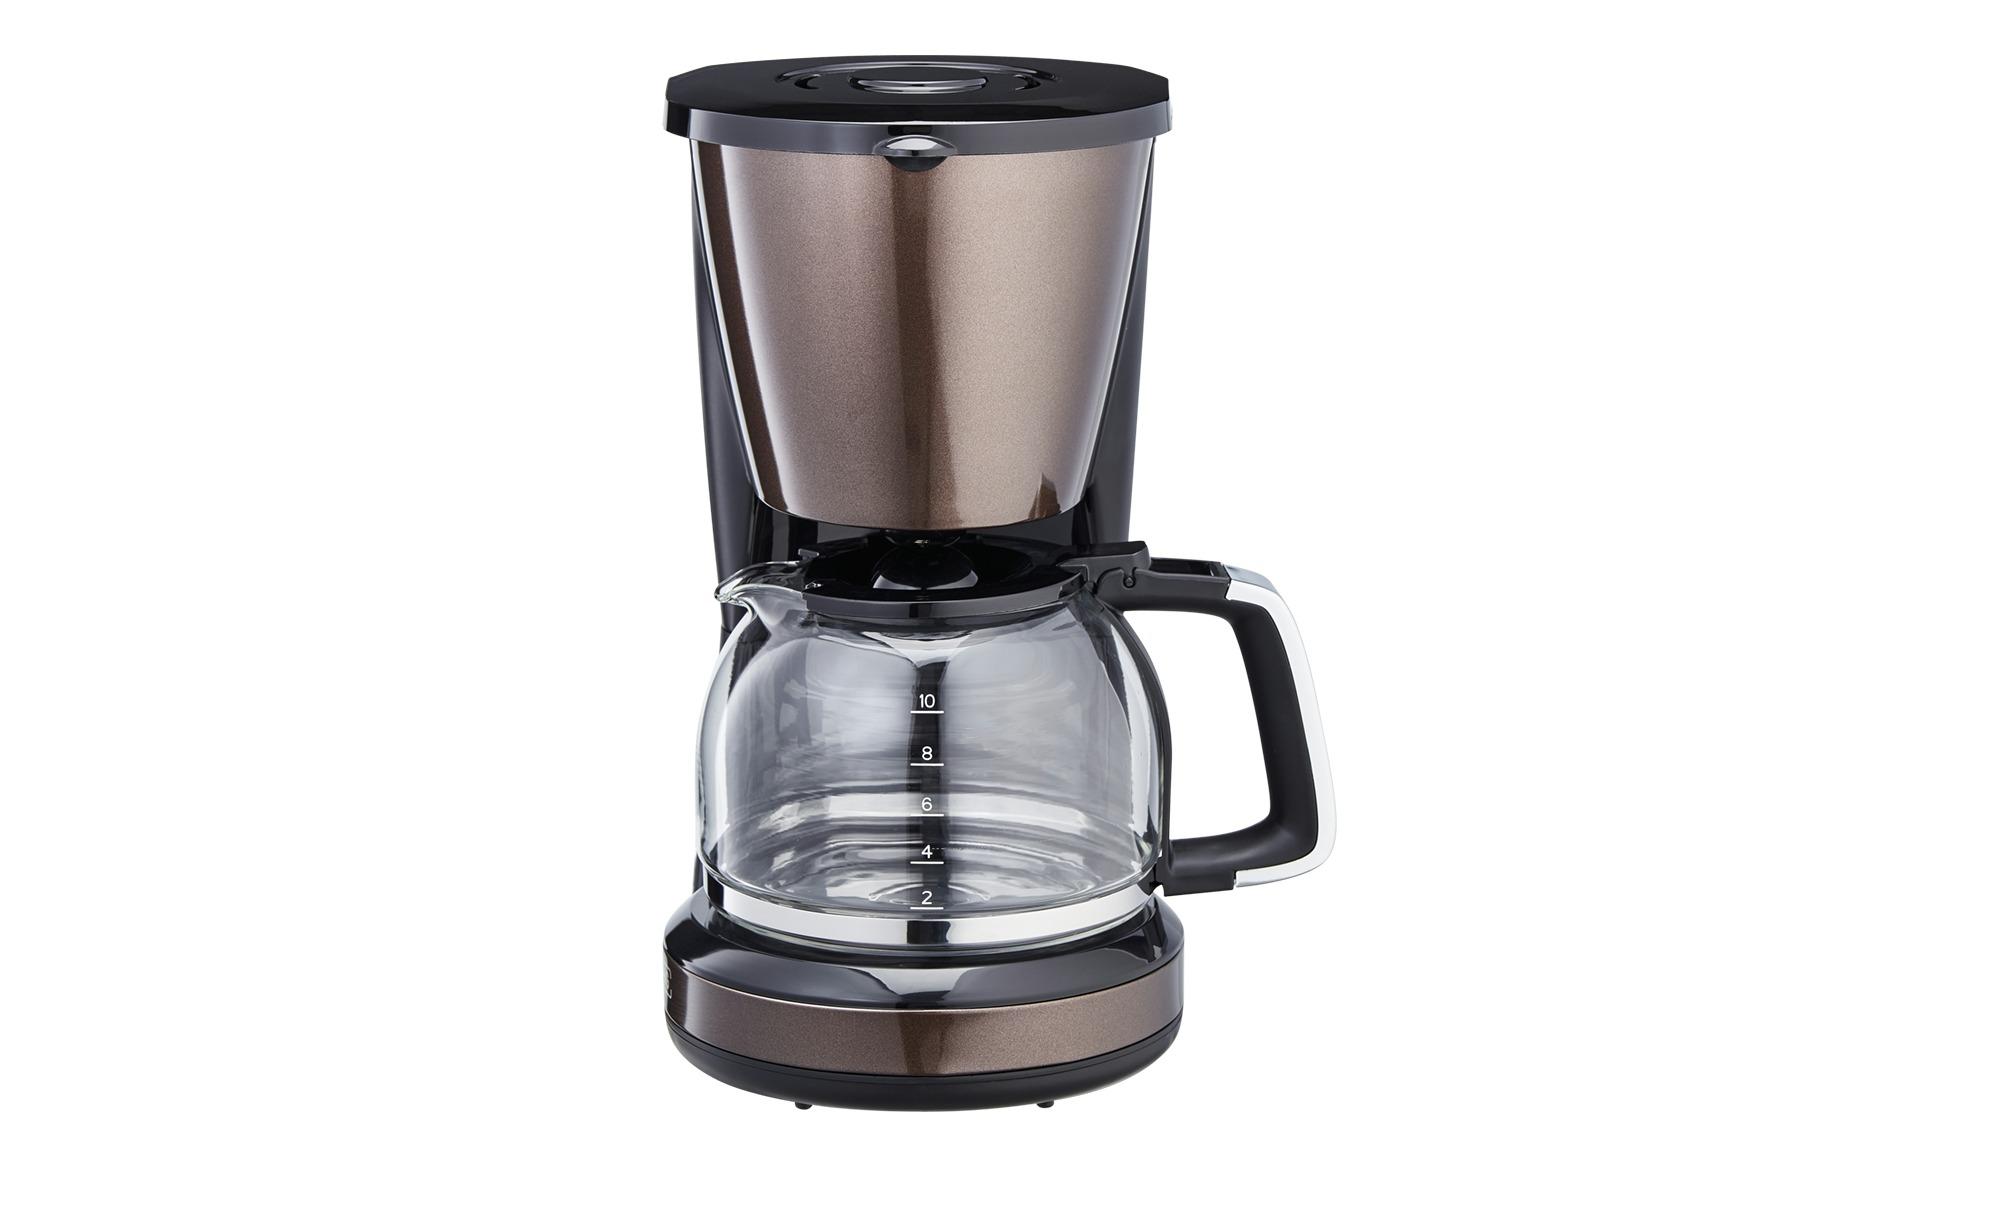 KHG Kaffeeautomat  KA-123(MMS) - braun - Kunststoff - 16,95 cm - 31,7 cm - 23,7 cm - Elektrokleingeräte > Kaffee & Espressomaschinen - Möbel Kraft   Küche und Esszimmer > Kaffee und Tee   KHG